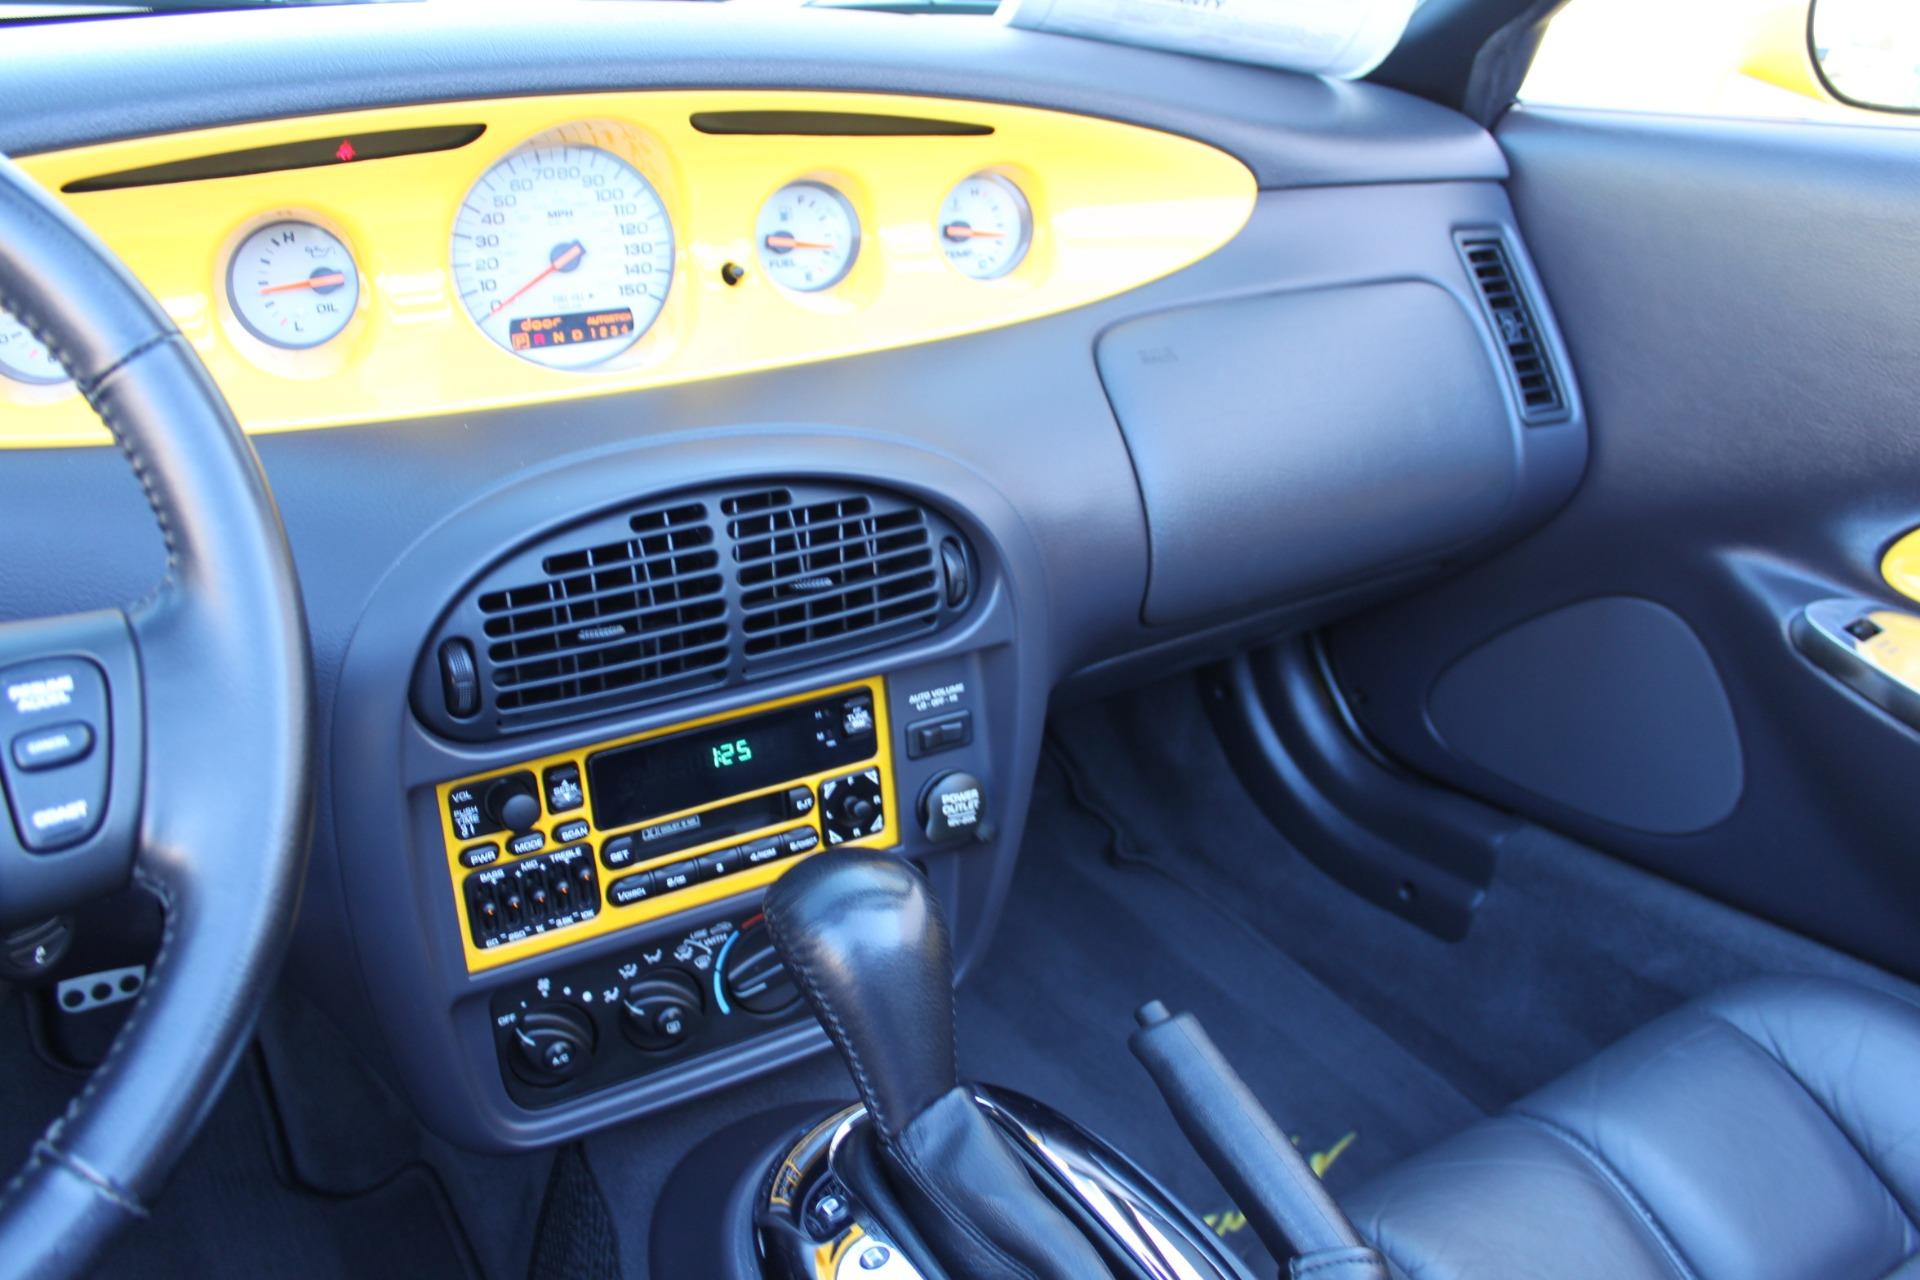 Used-2002-Chrysler-Prowler-BMW